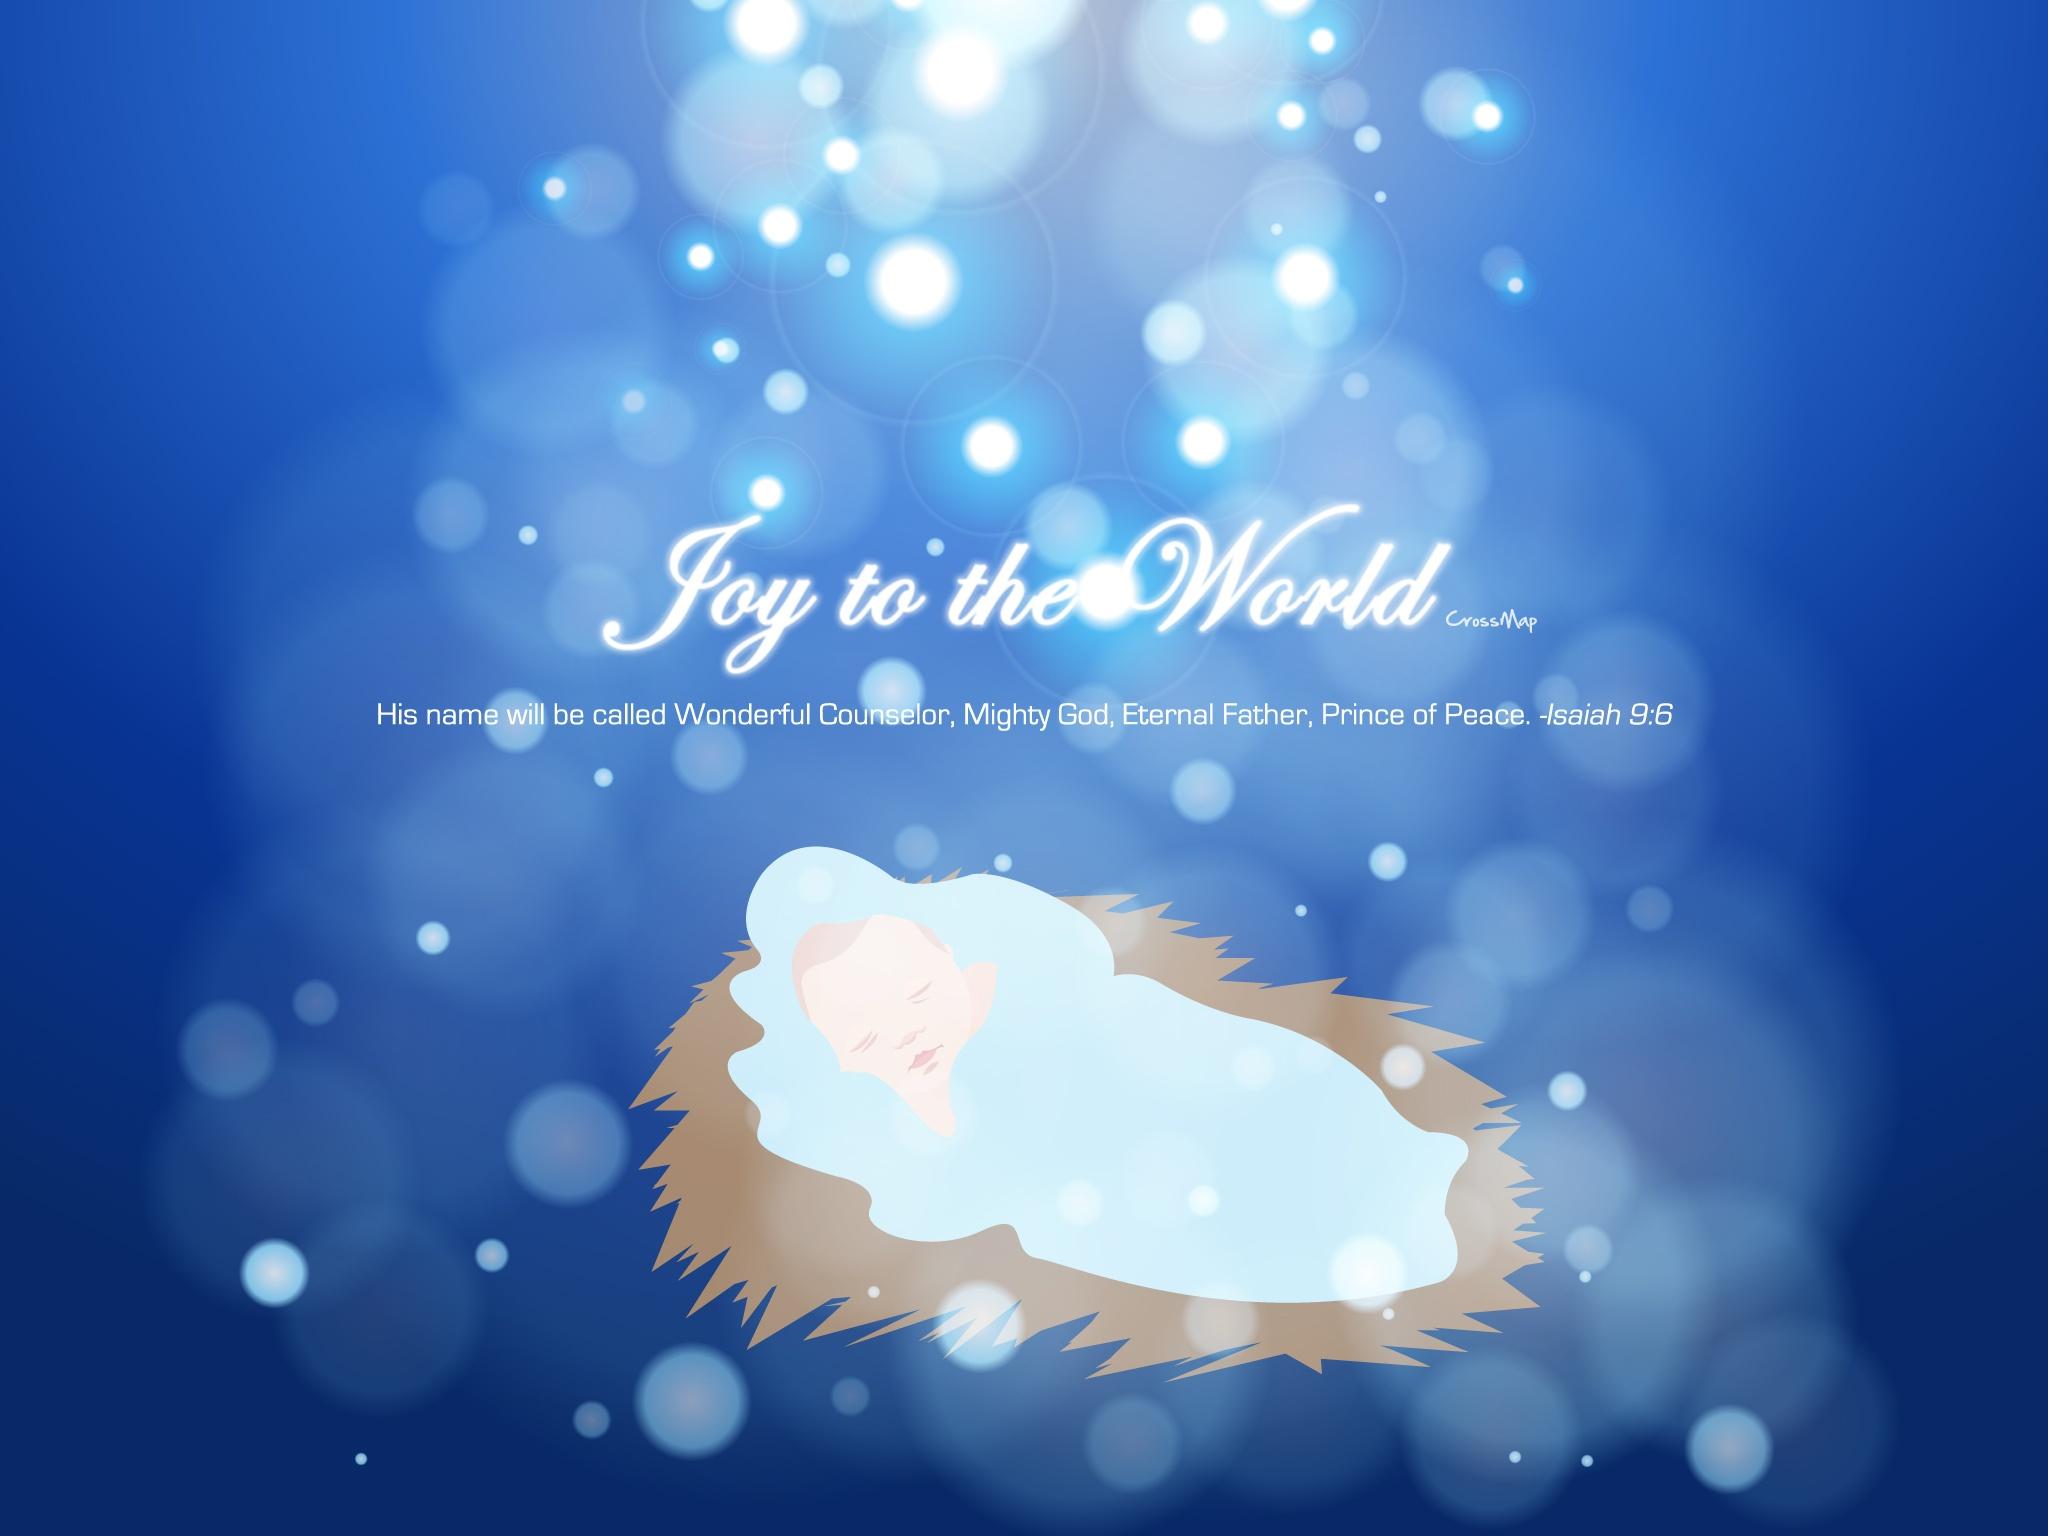 Joy to the World Crossmap 2048x1536